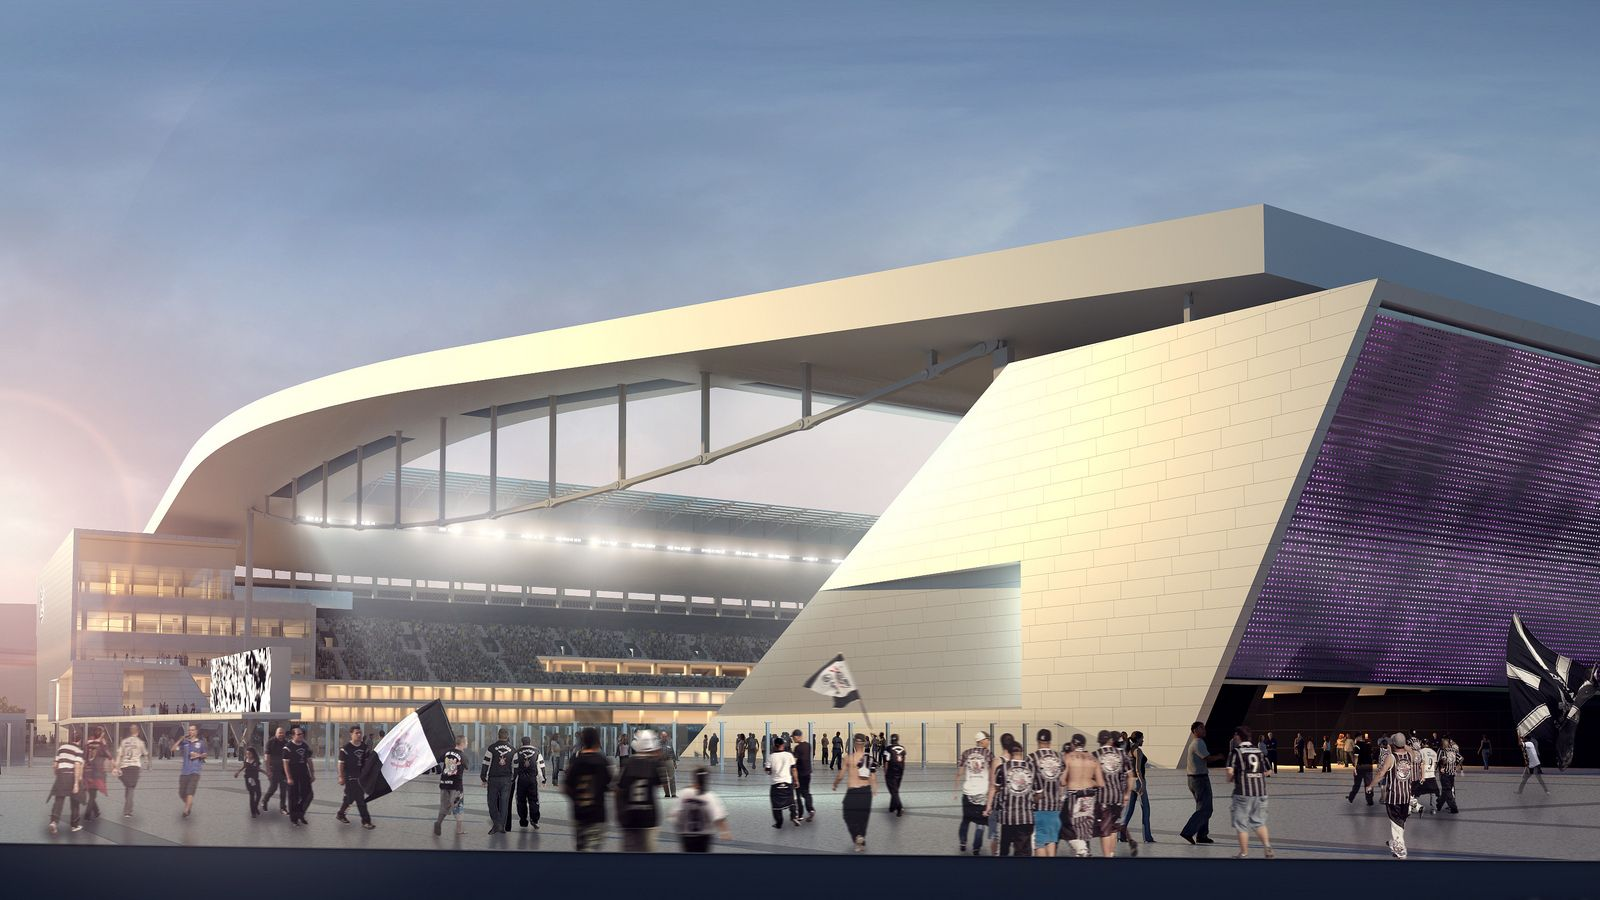 Fotos Corinthians ~ Design Arena Corinthians u2013 StadiumDB com